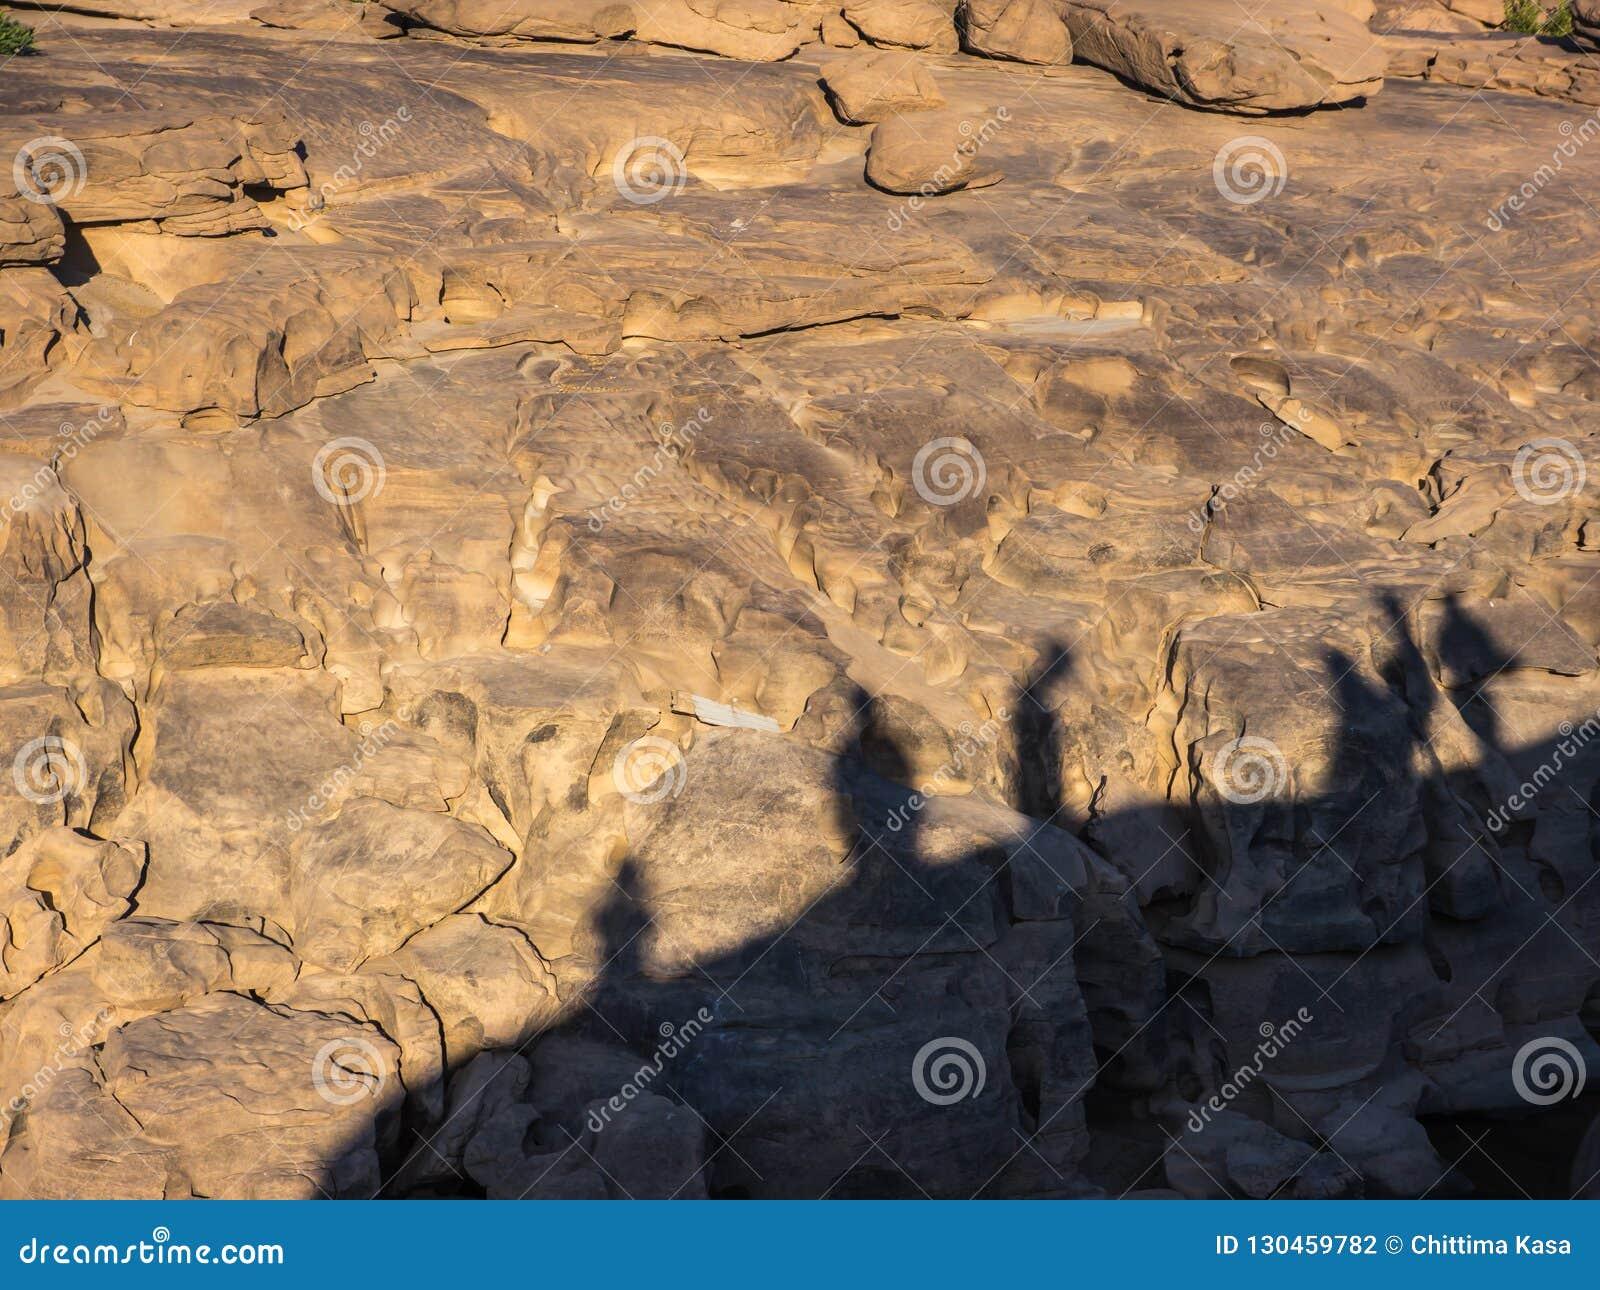 the mountain shadow epub download